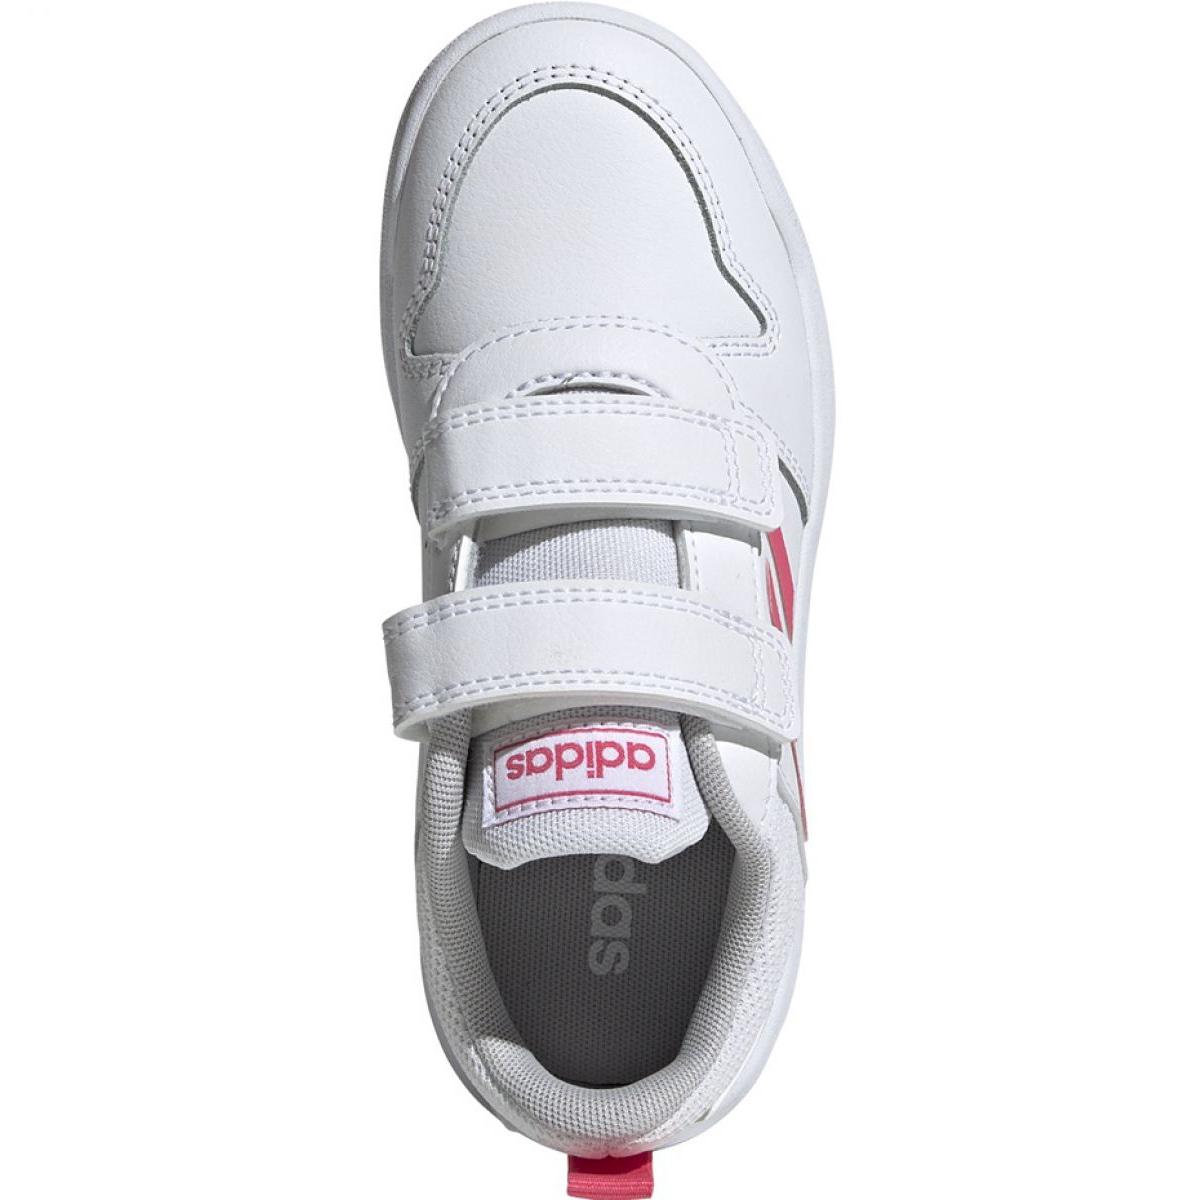 Adidas Tensaur C EF1097 cipő fehér